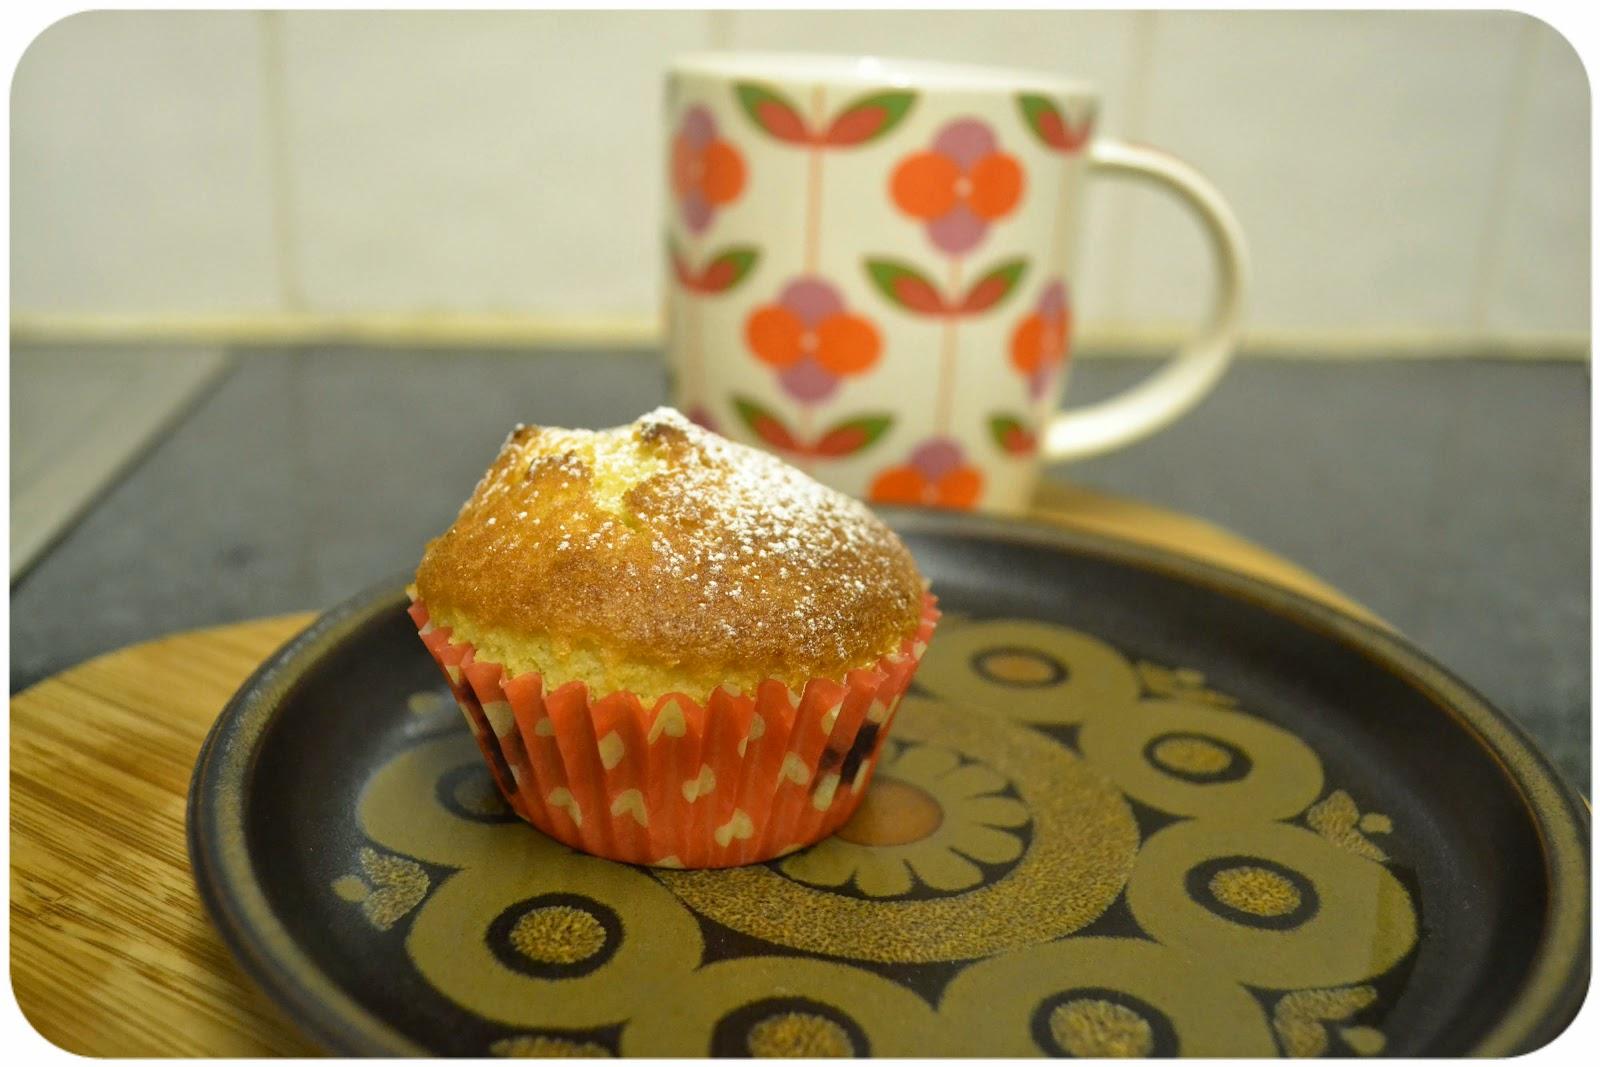 Chokeberry cupcakes